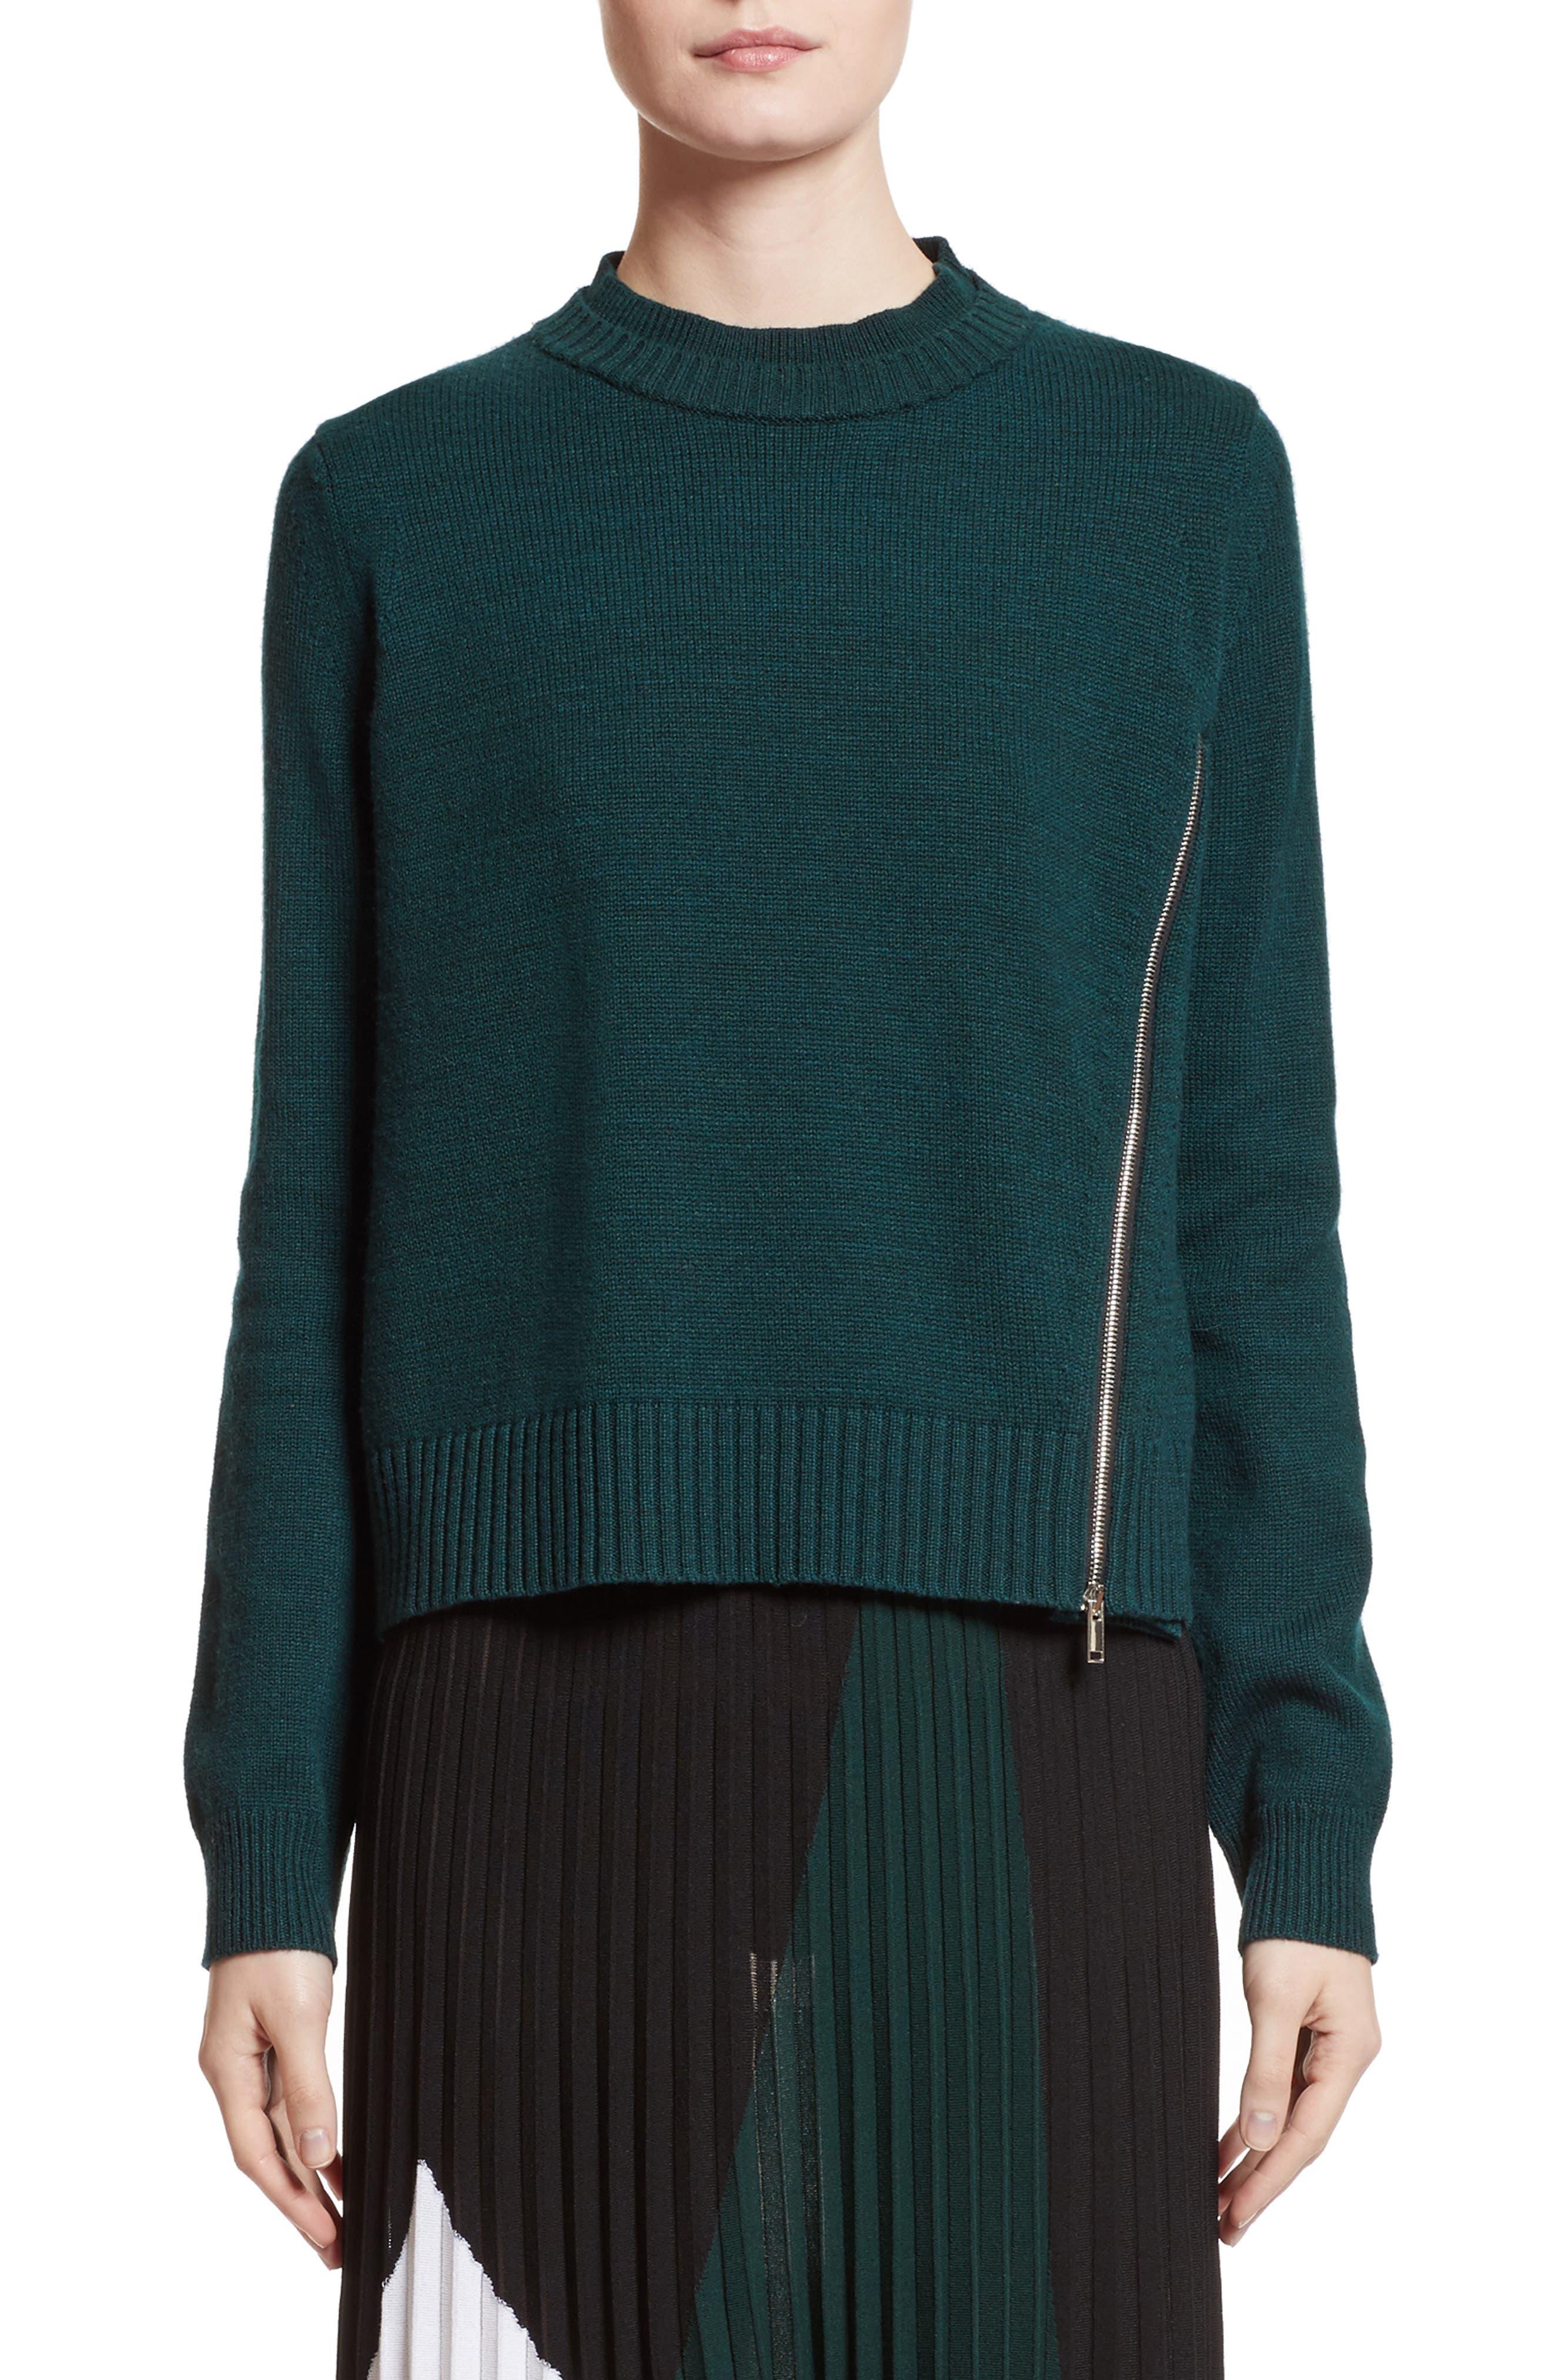 Proenza Schouler Wool, Silk & Cashmere Pullover